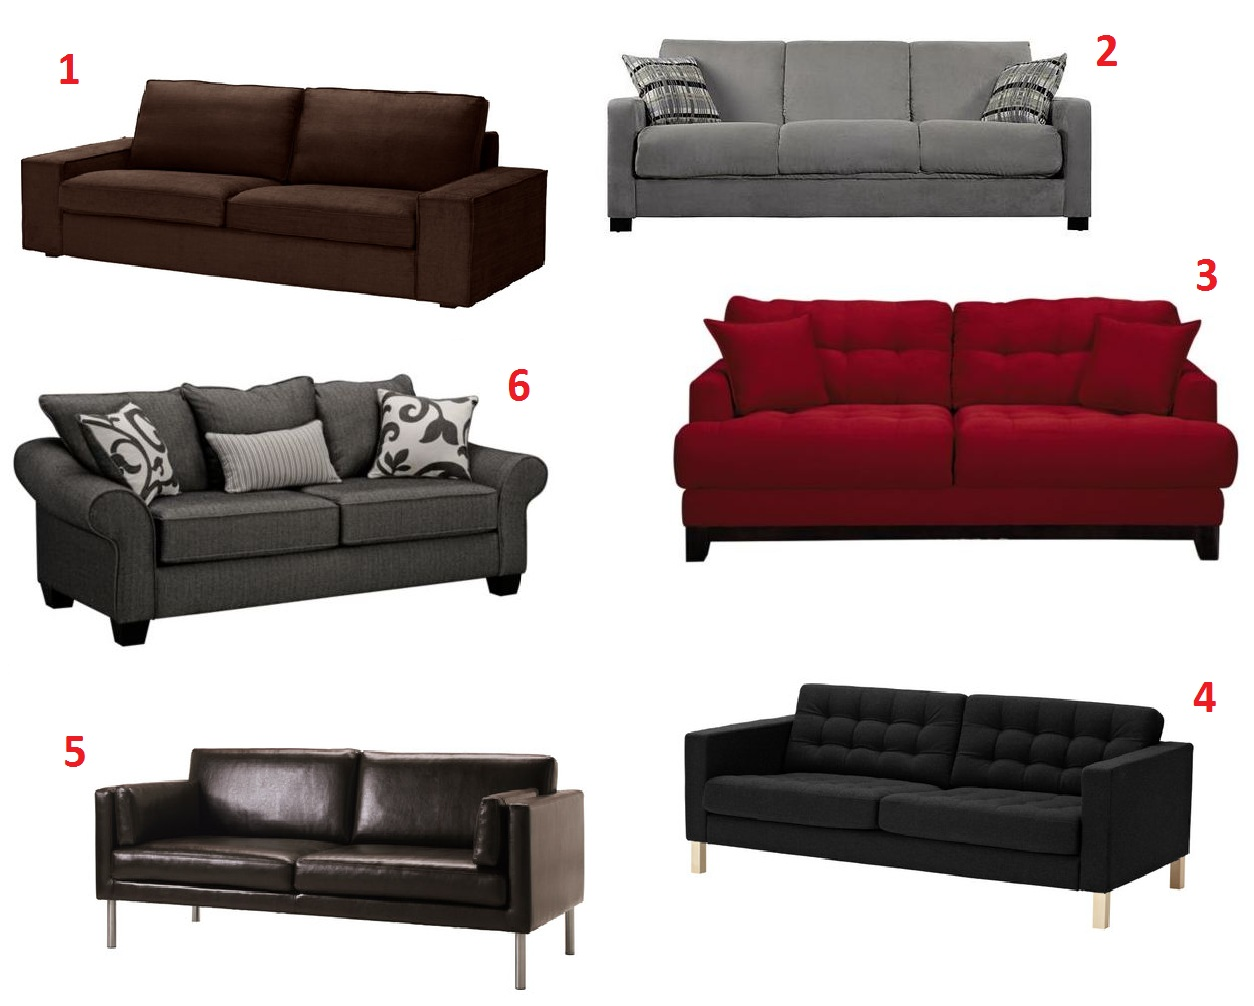 modern sleeper sofa under 1000 rockers kruder dorfmeister s apartment 528 product roundup 28 couches